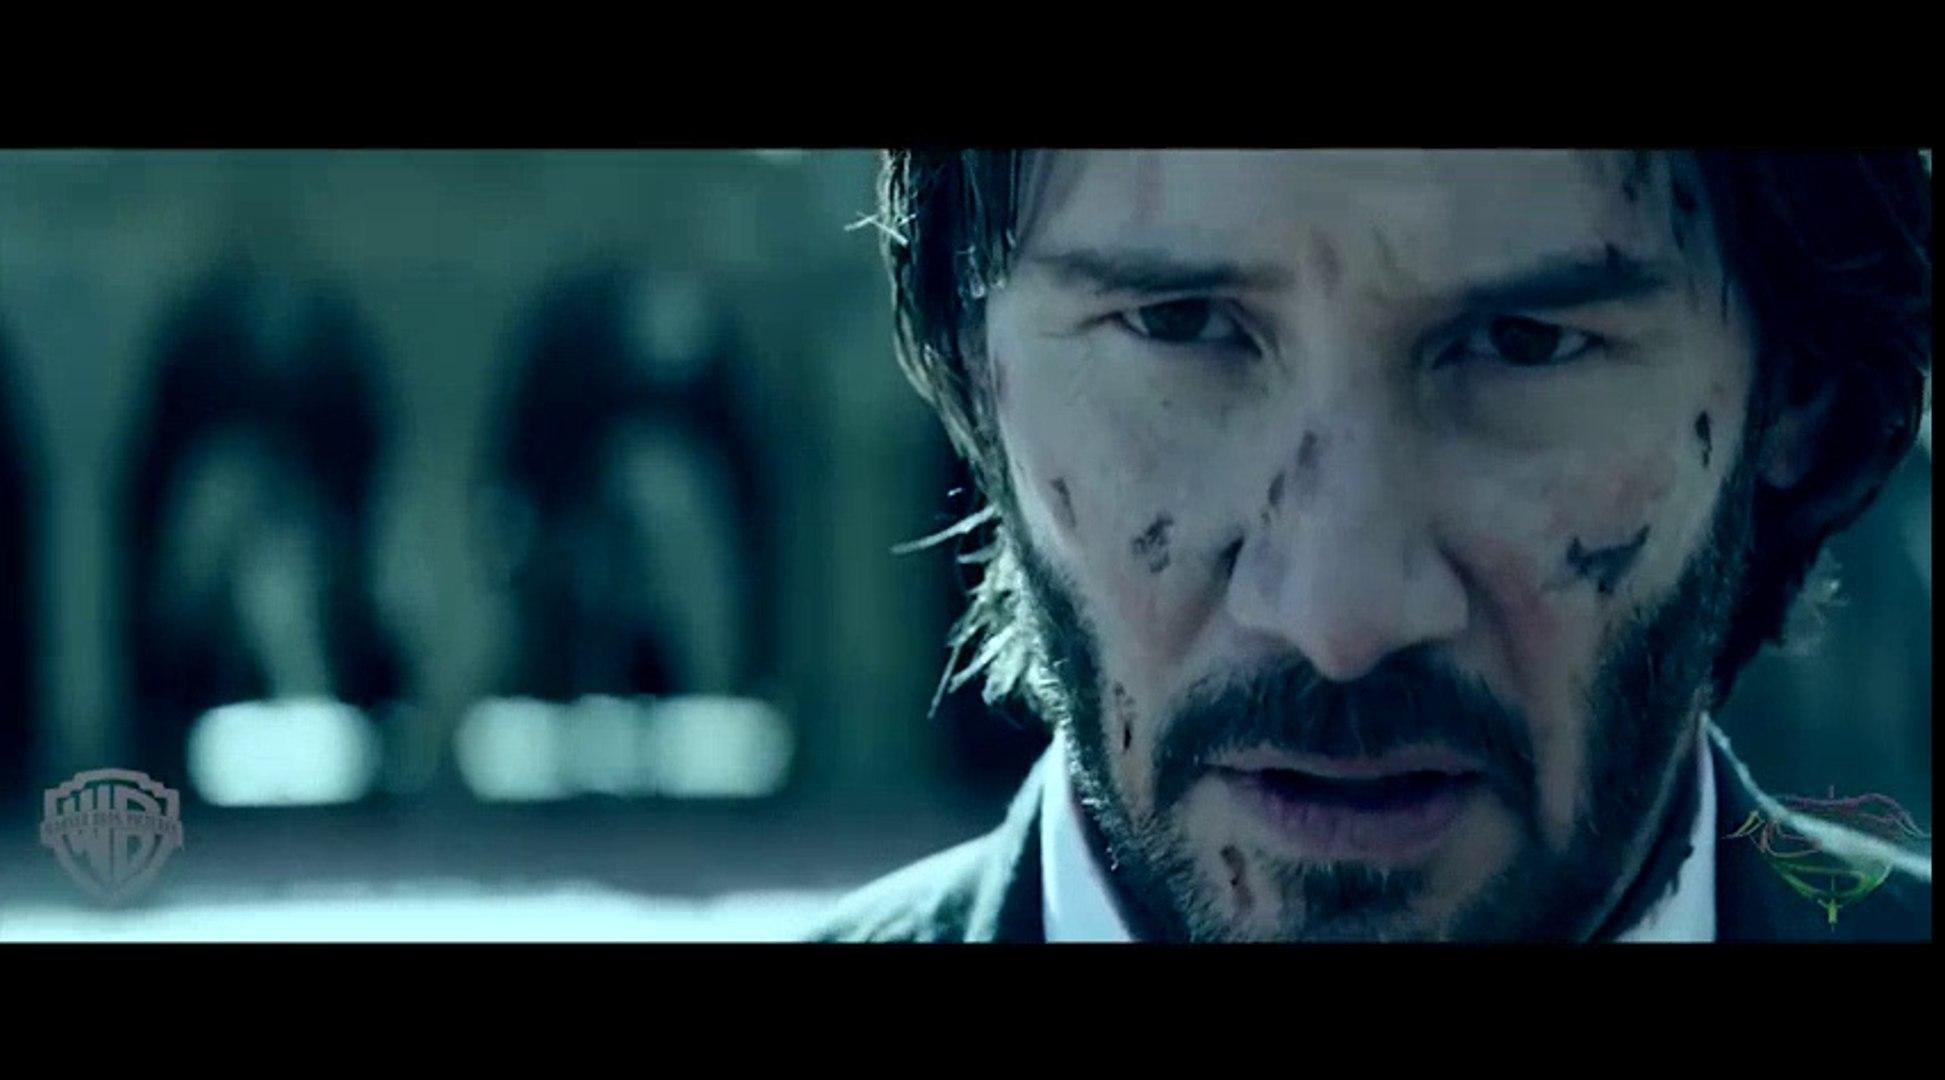 Nonton Online Film John Wick 3 Full Movie Subtitle ...